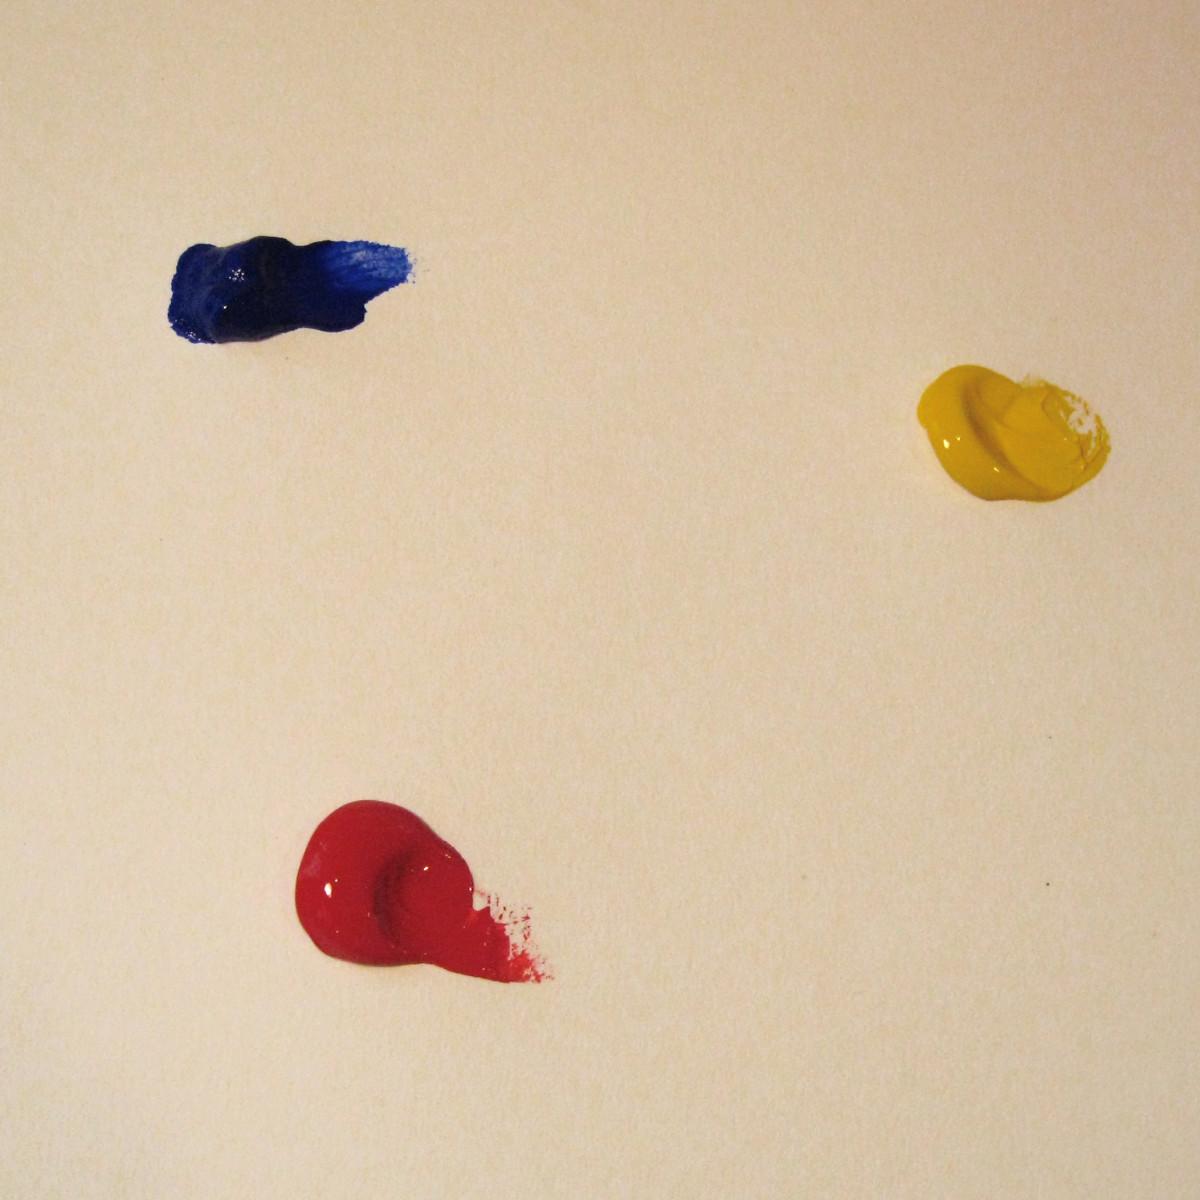 I started with three primary colors: Ultramarine Blue, Naphthol Red Medium, and C.P. Cadmium Yellow Medium.